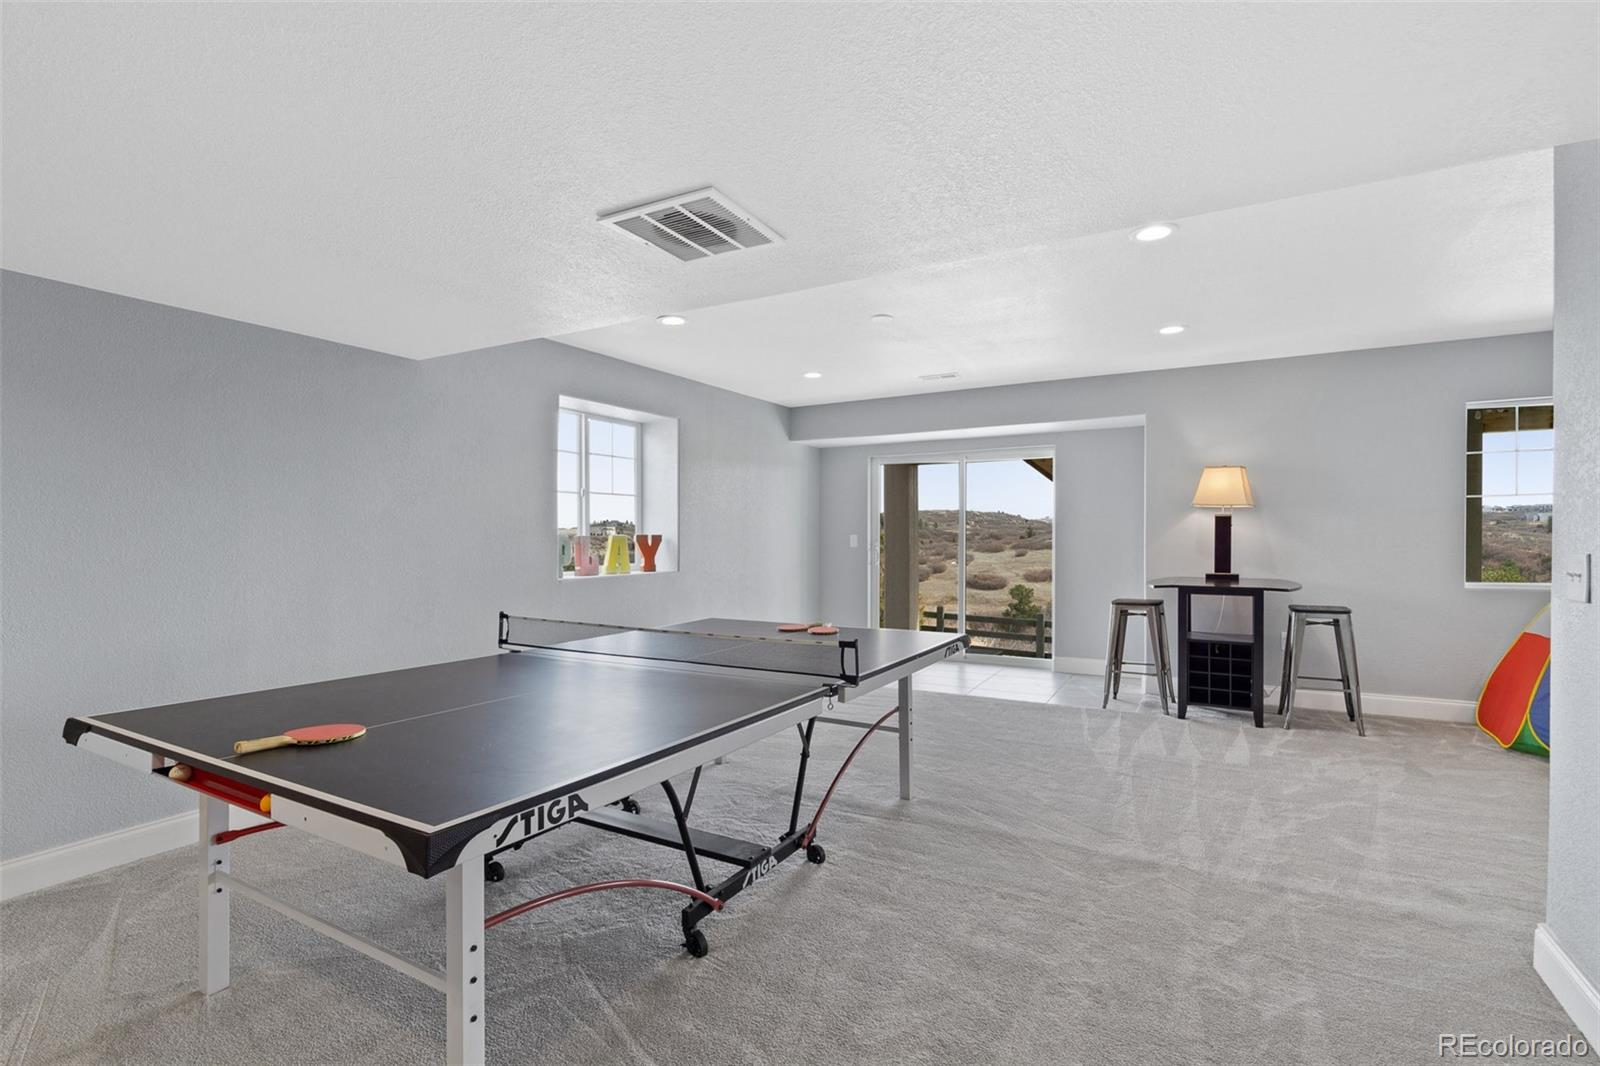 MLS# 3370359 - 34 - 4195 Red Bird Court, Castle Rock, CO 80108